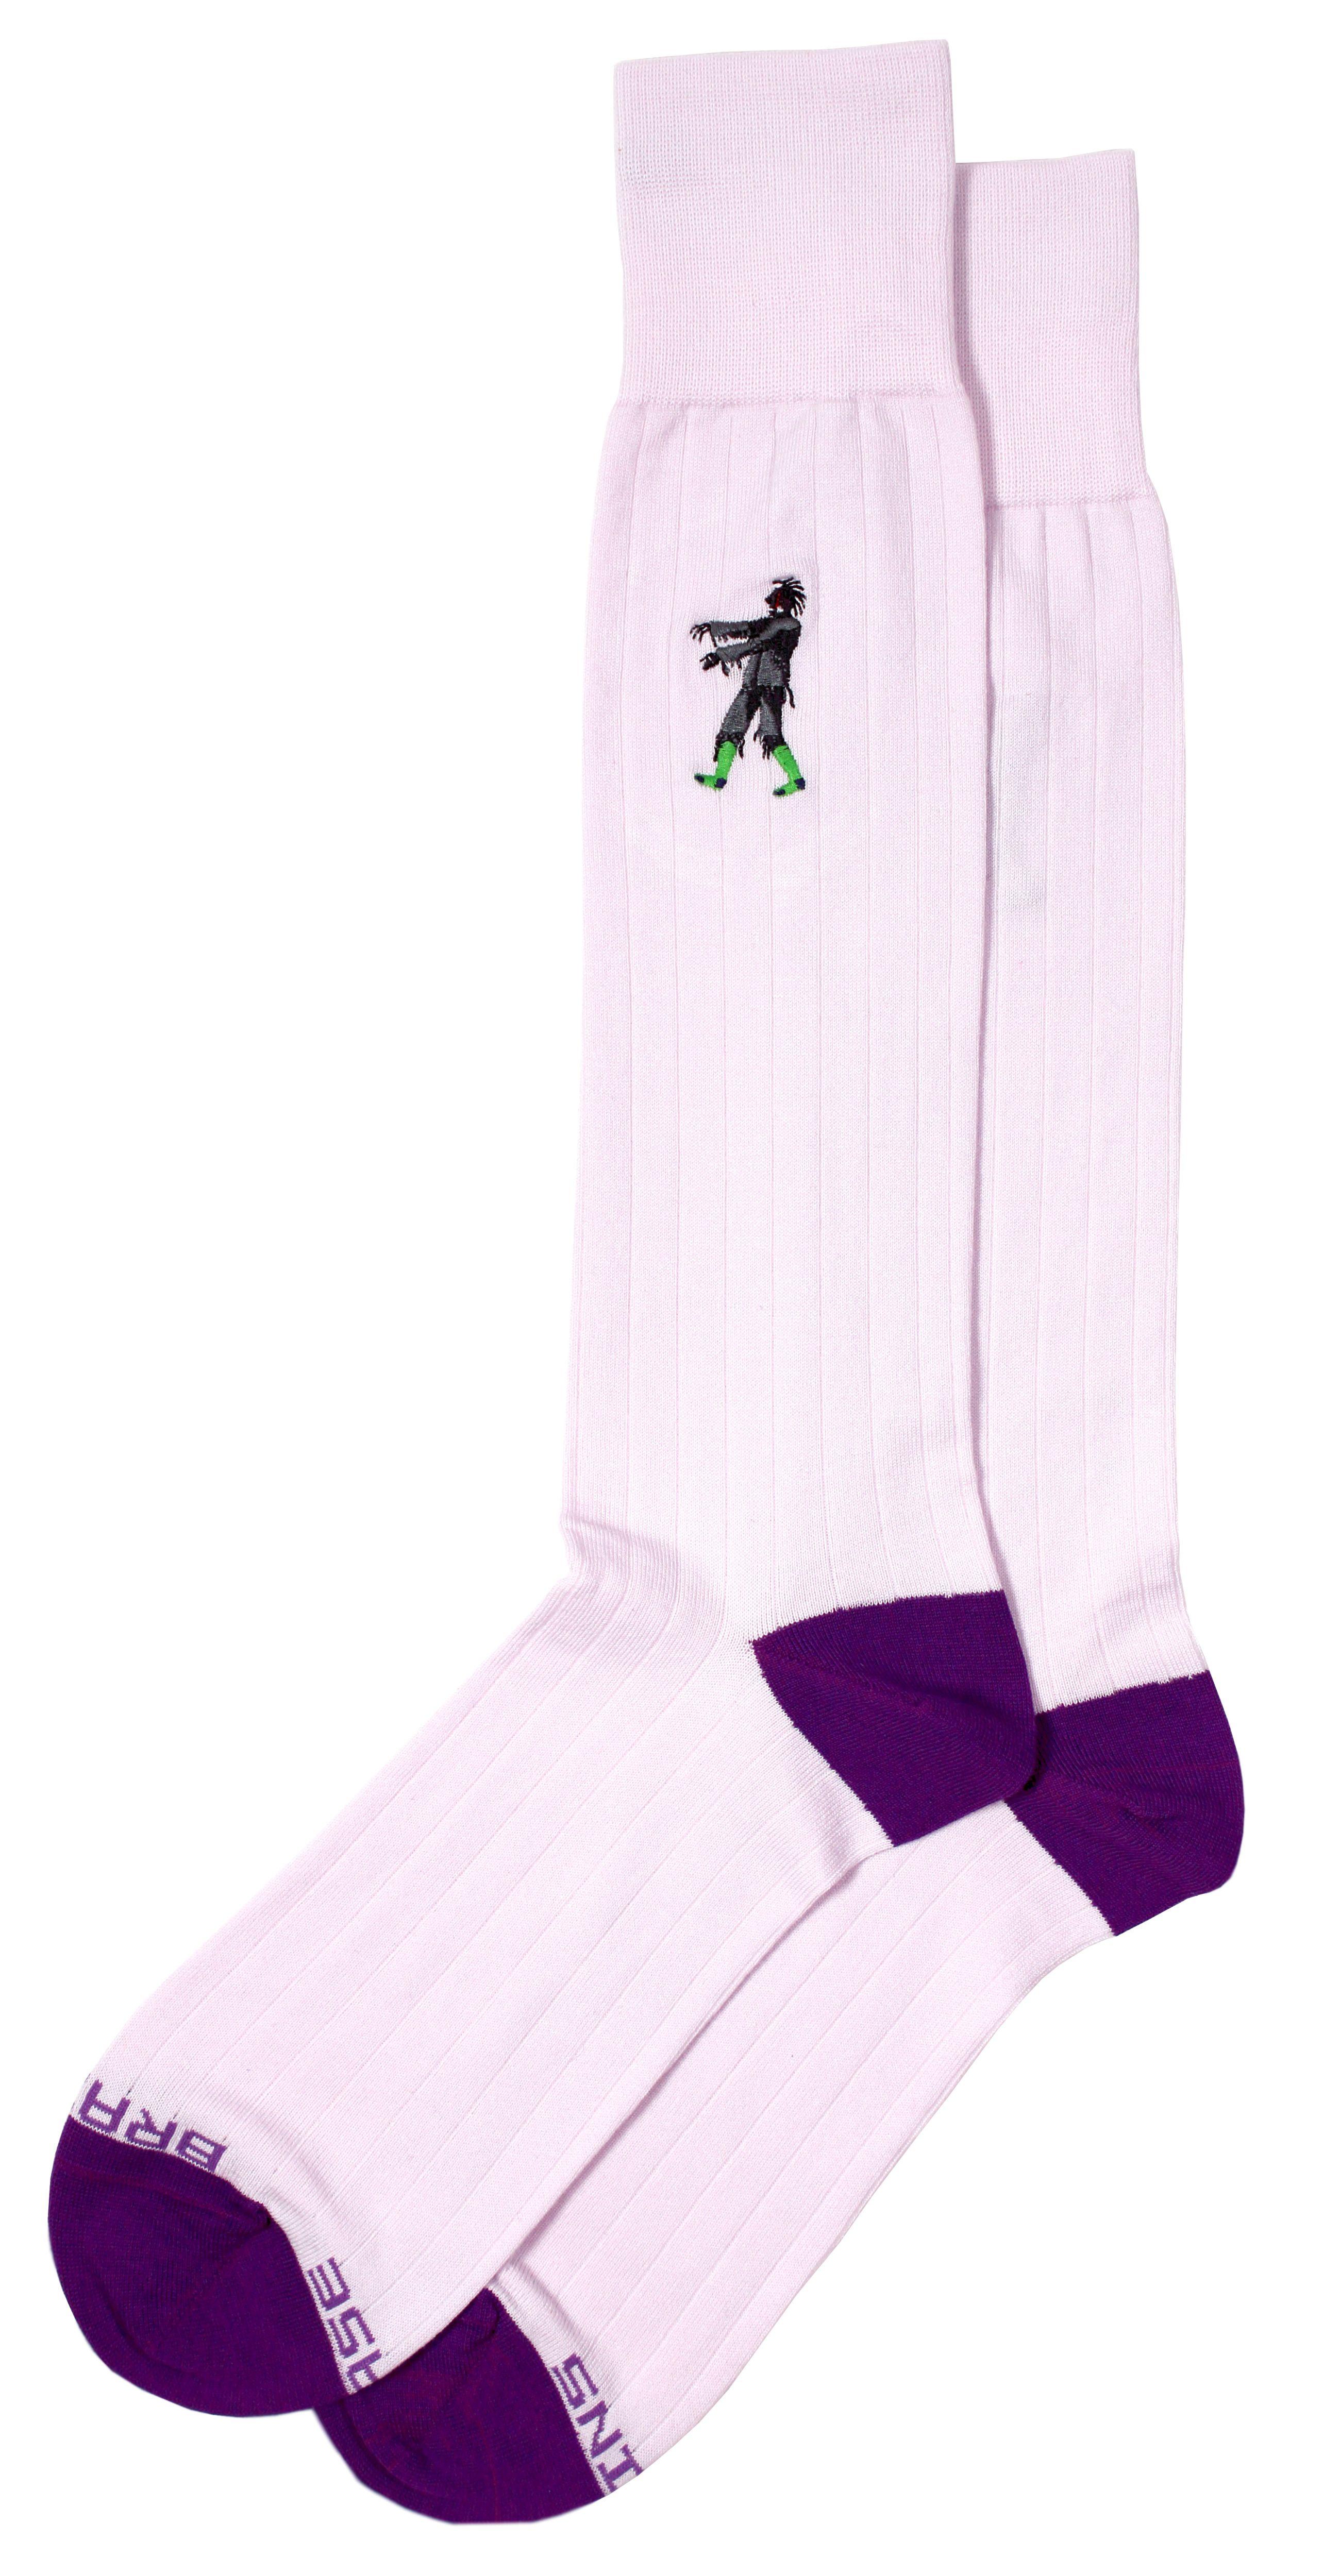 Purple dress socks  These themed dress socks feature Peruvian Pima cotton in a classic